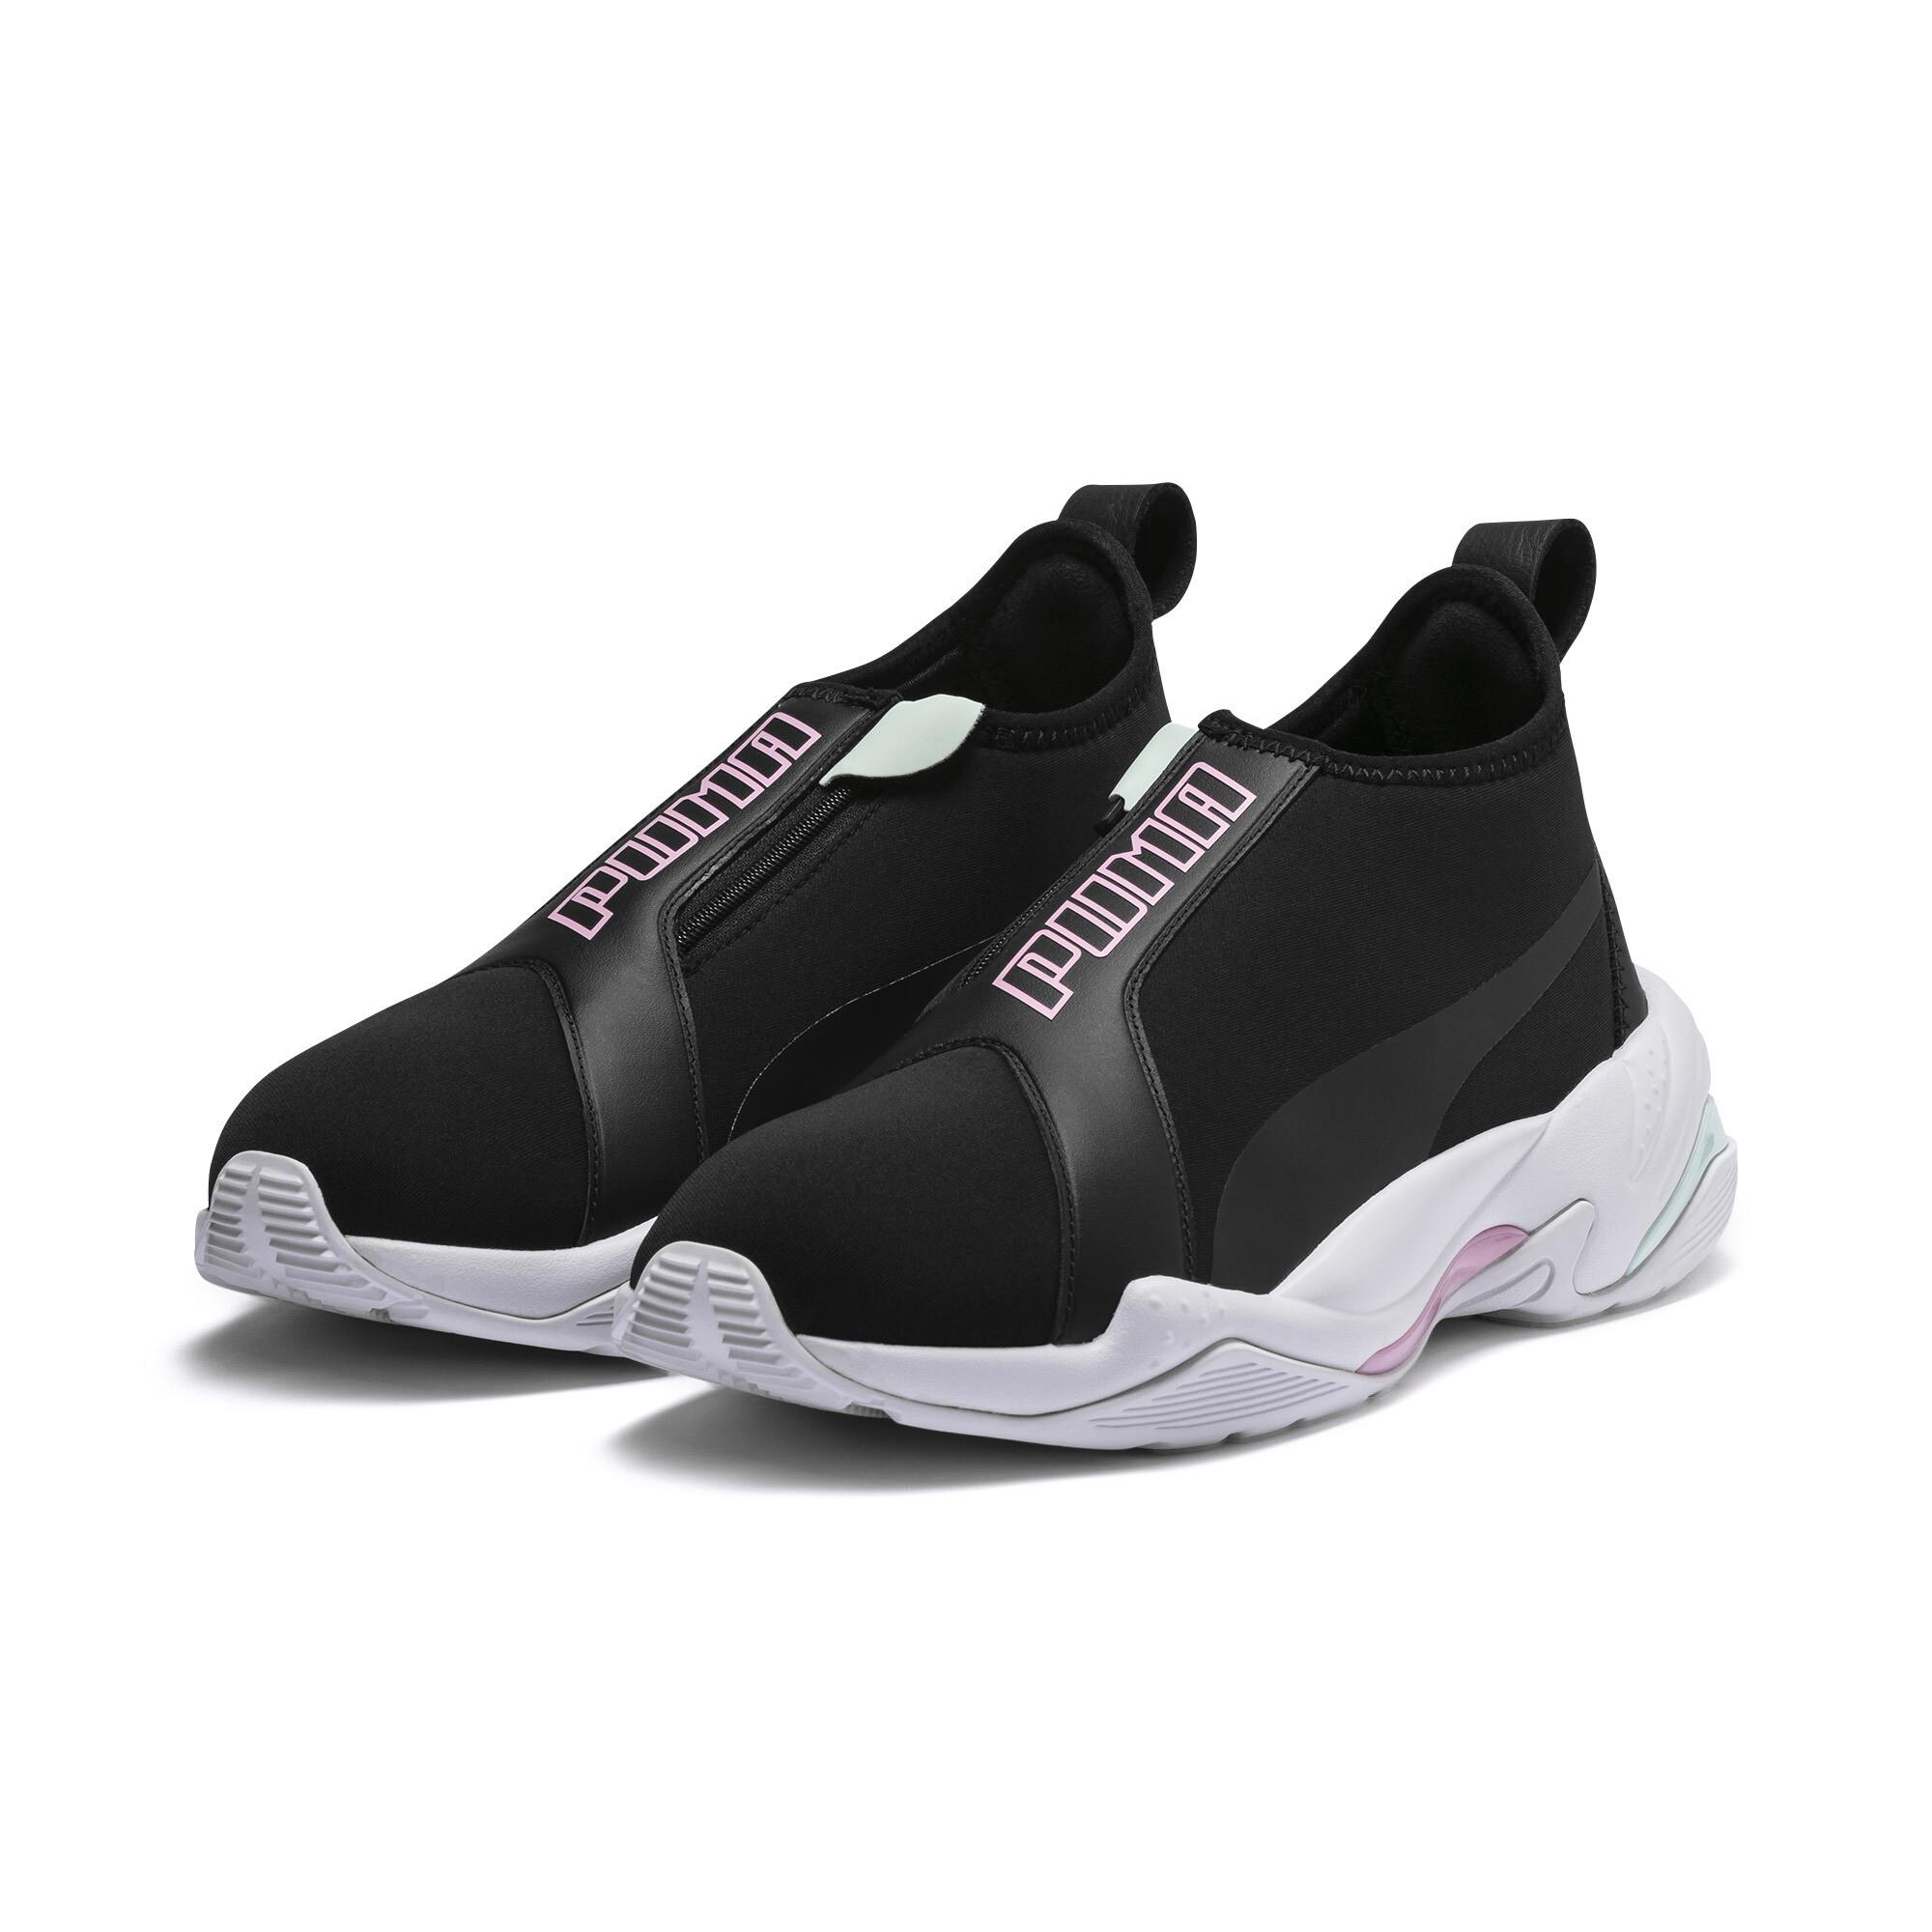 Image Puma Thunder TZ Women's Sneakers #3